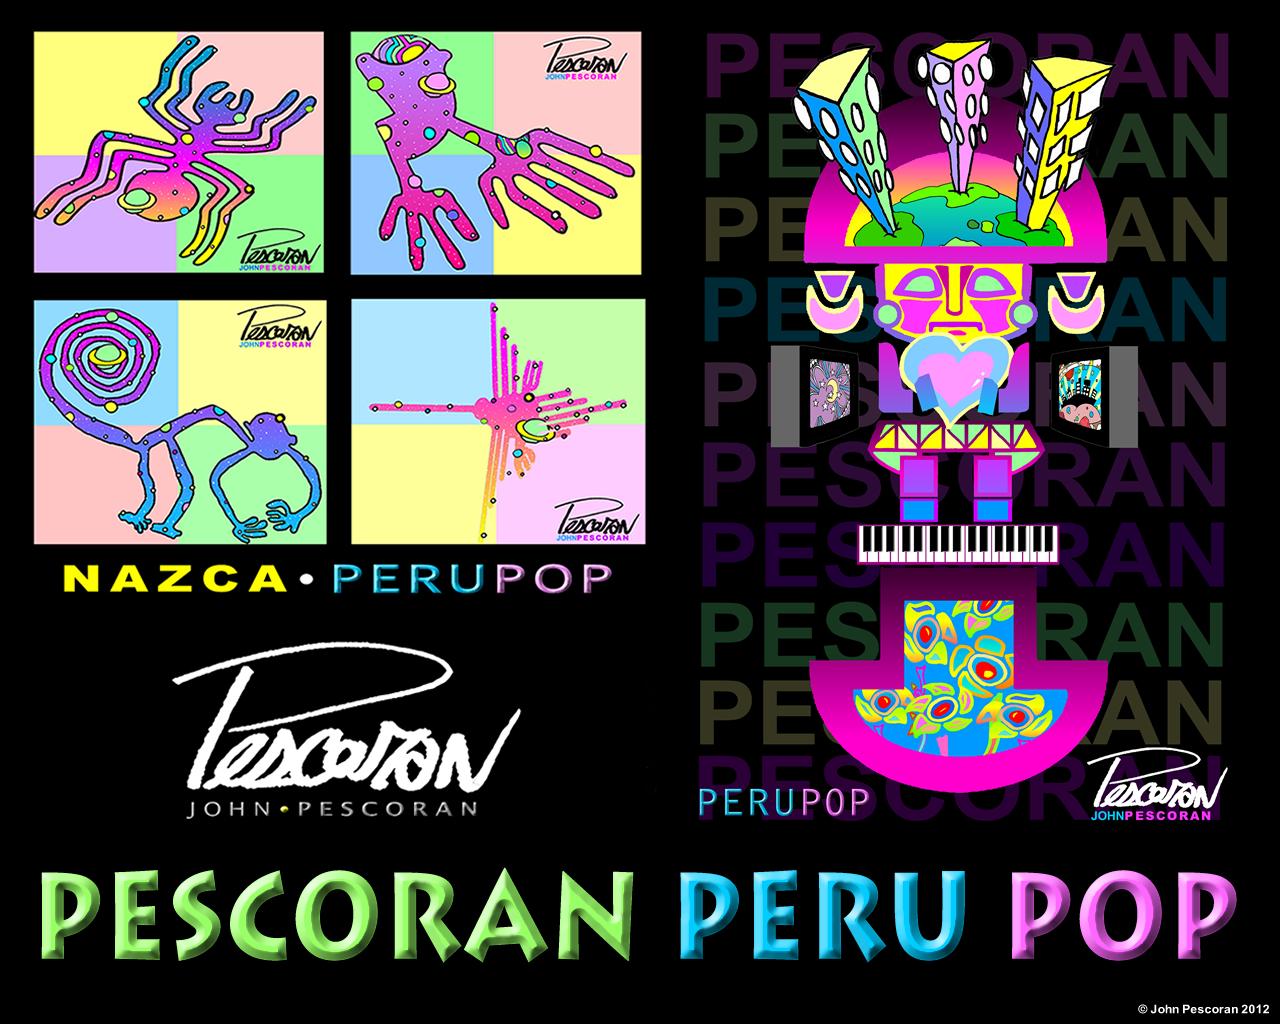 http://1.bp.blogspot.com/-94IEdVPy1O8/Tv9zsaINXnI/AAAAAAAAAF8/76glkjQmZBw/s1600/PESCORAN+-+PERU+POP+-+Wallpaper+Promo.jpg